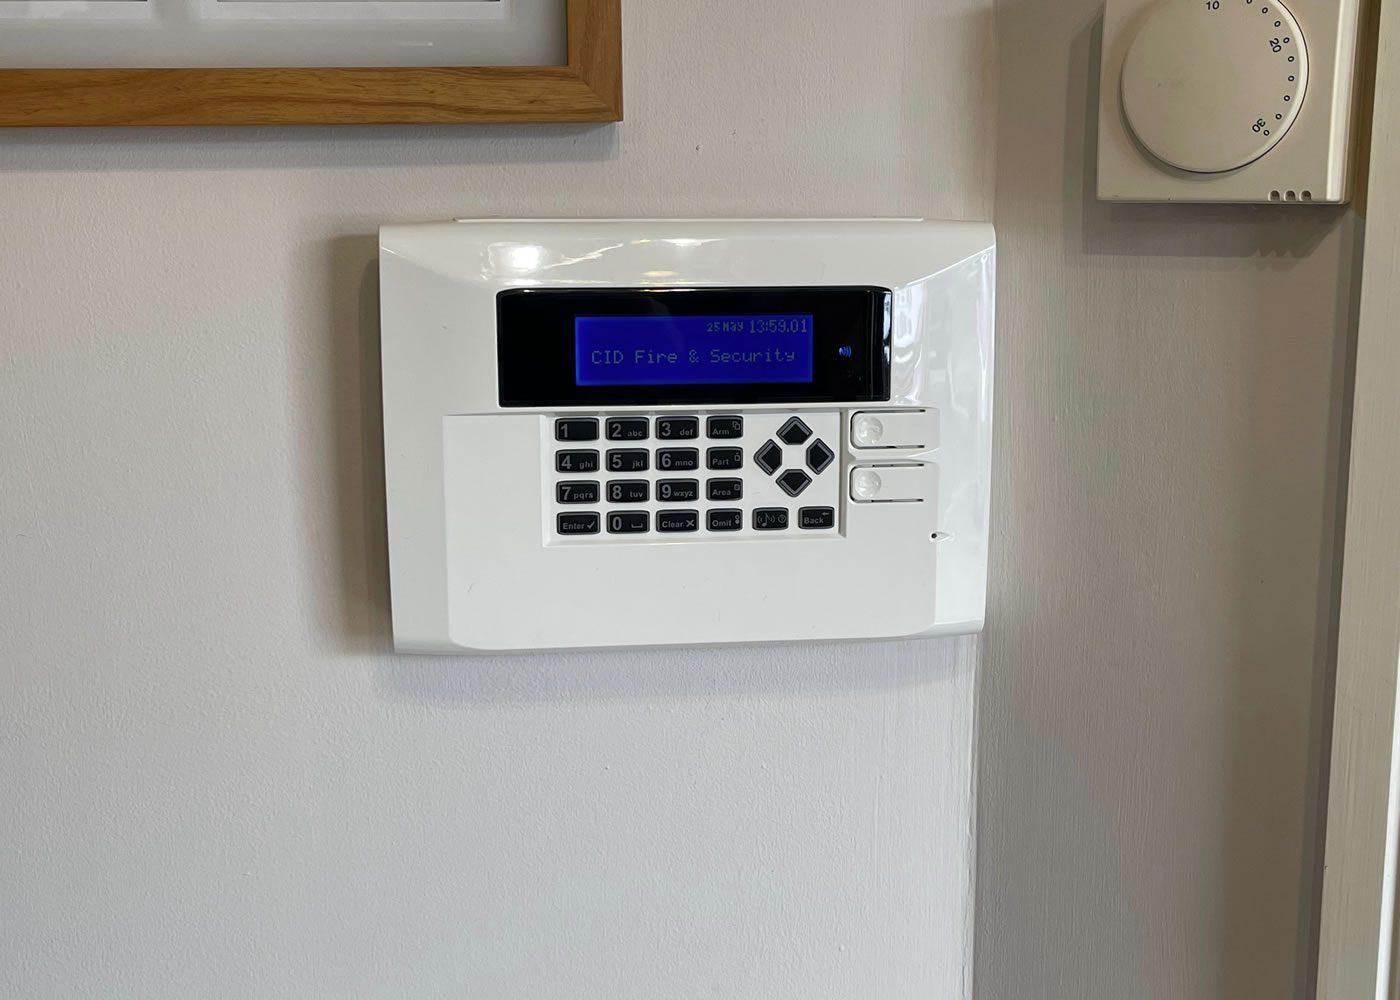 cid-intruder-alarms